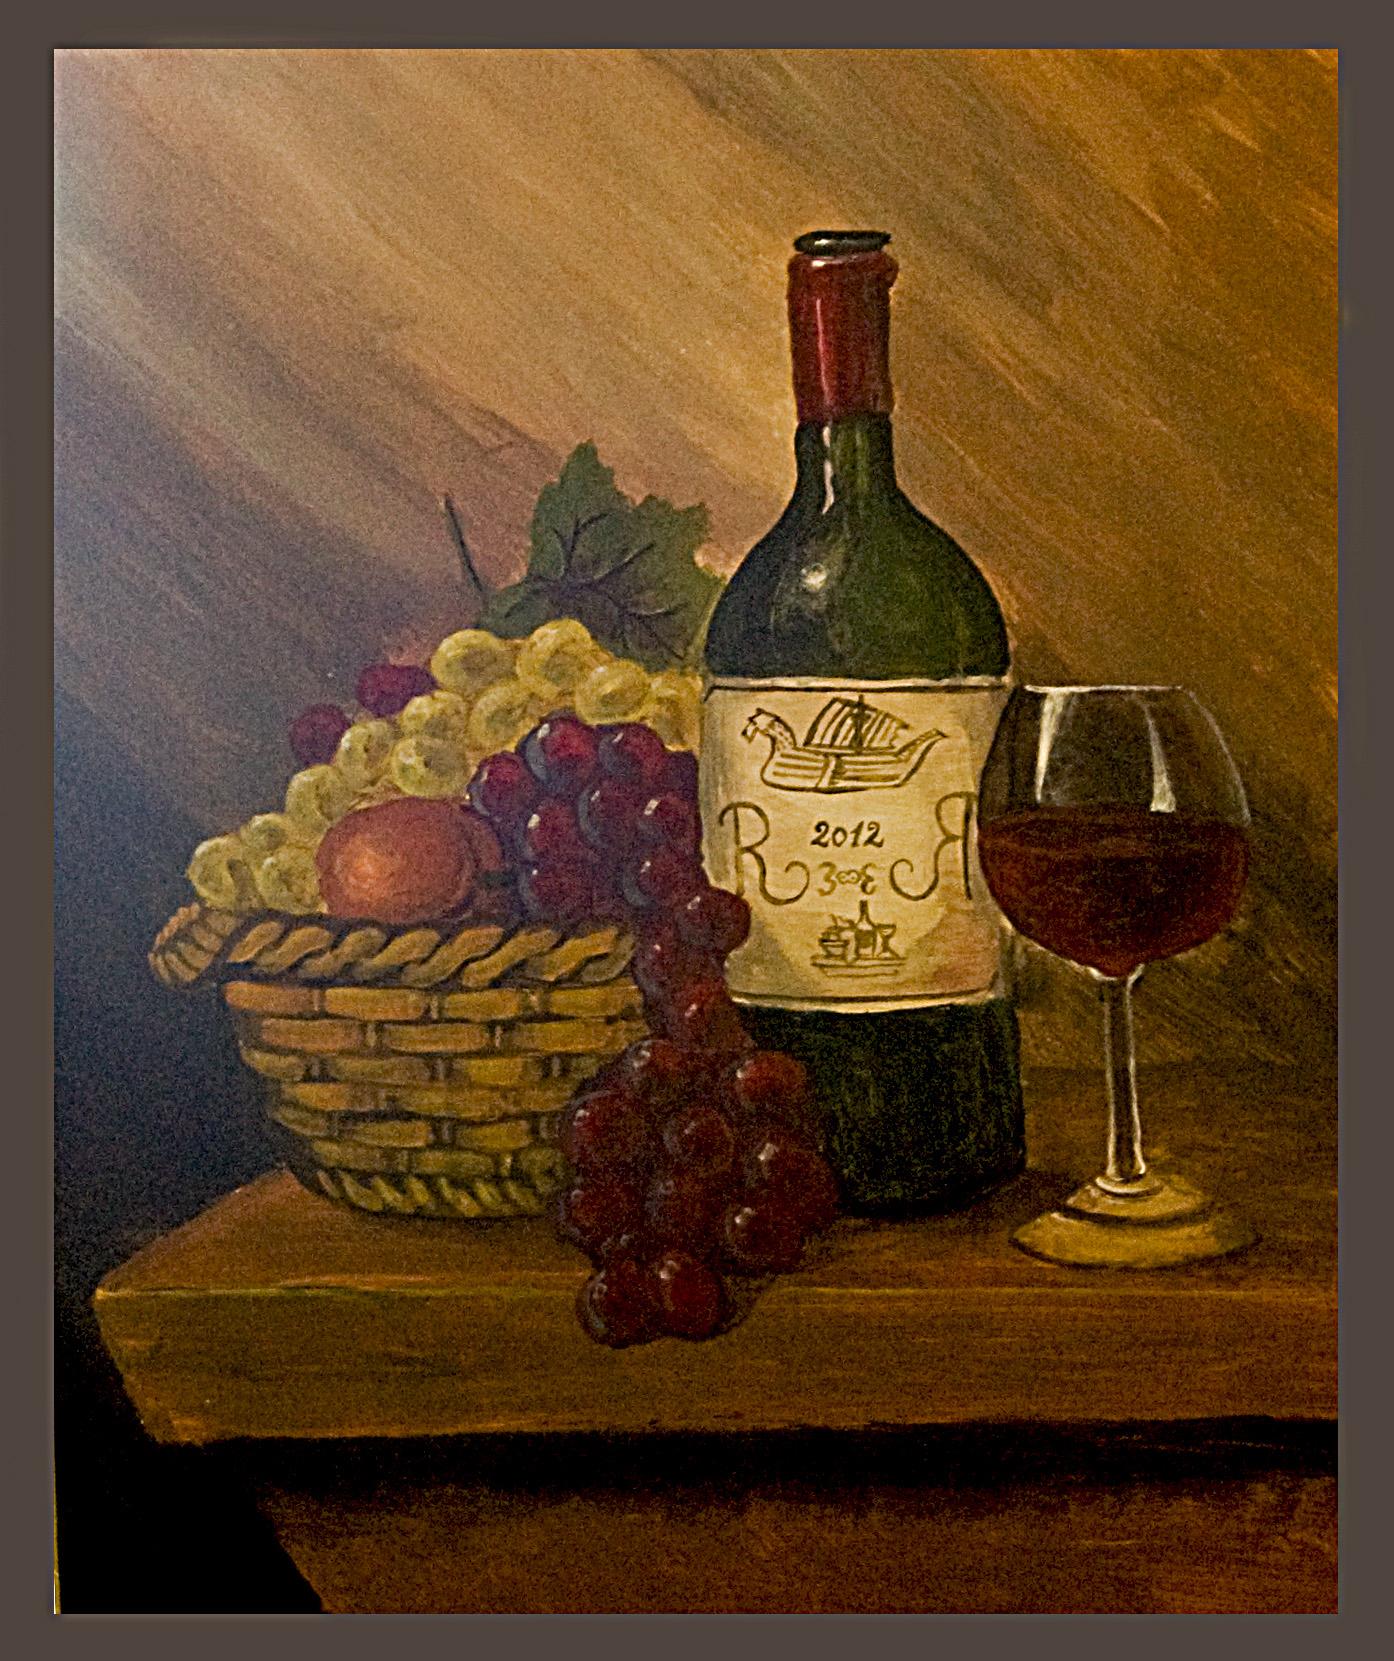 Still nature_wine